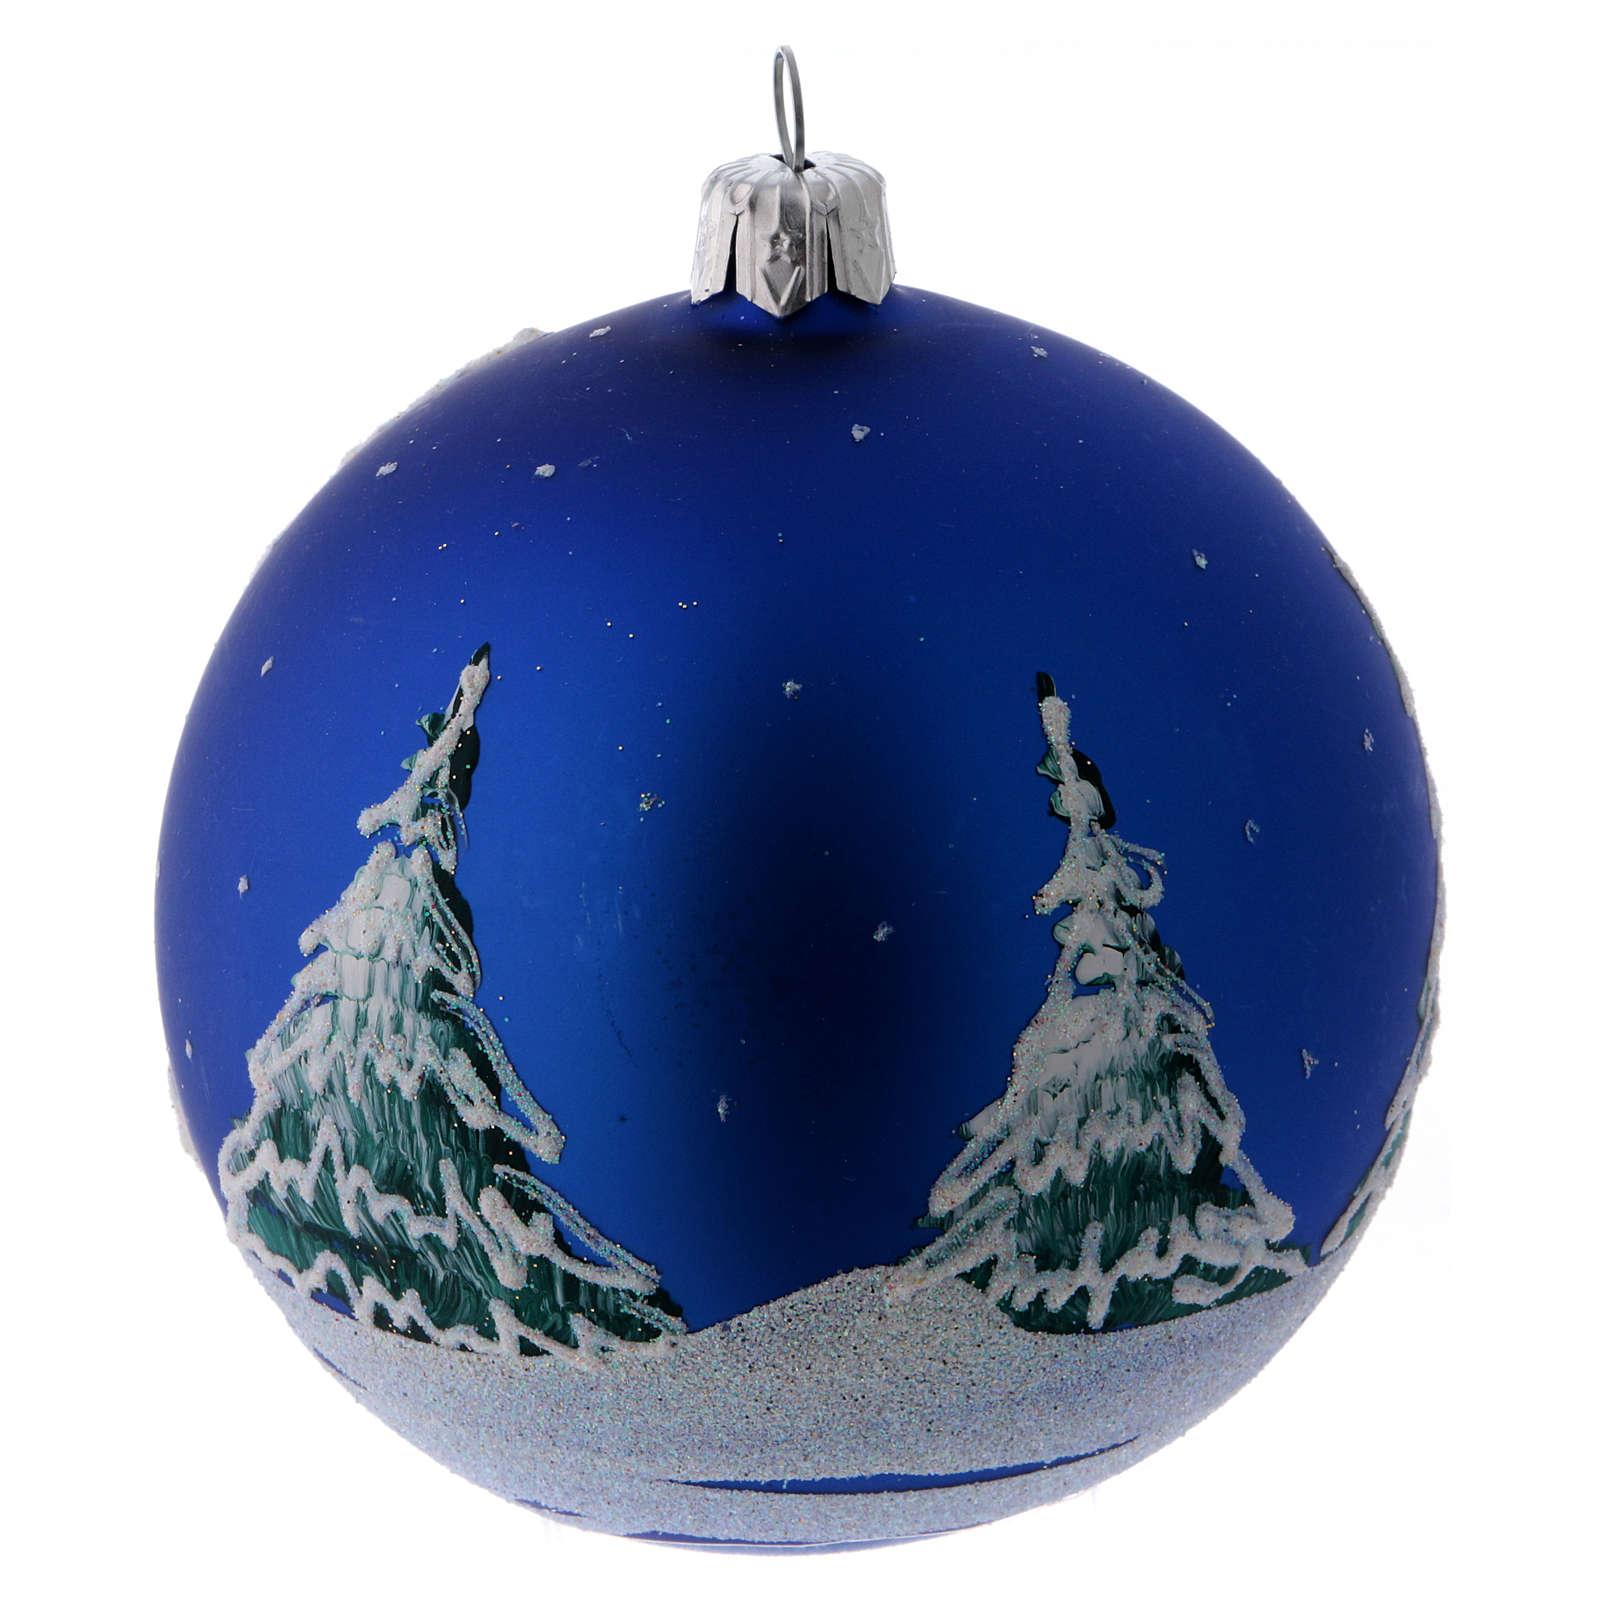 Pallina Natale vetro blu e alberi innevati decorati 100 mm 4